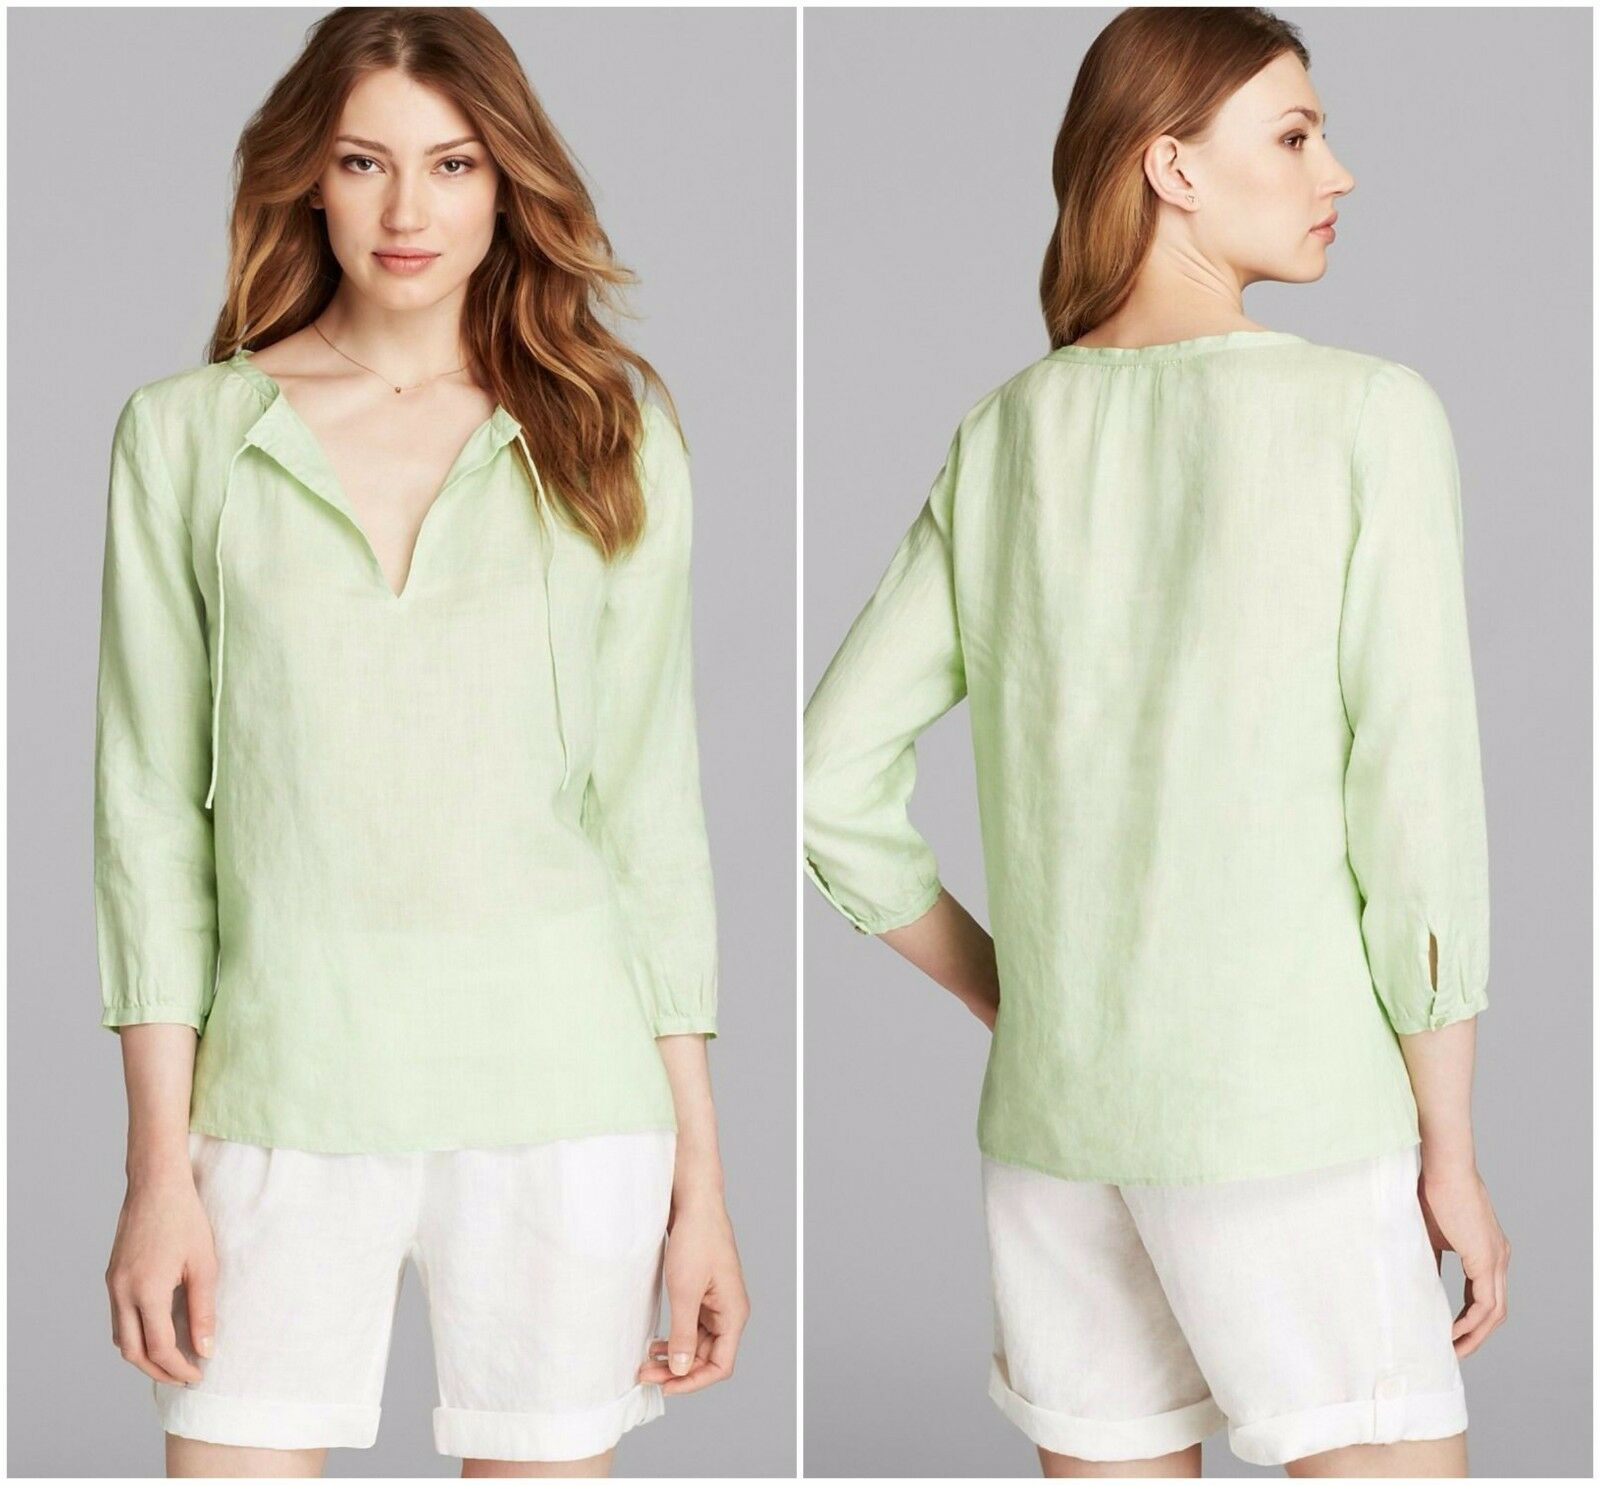 NWT EILEEN FISHER  P P  Pale Leaf Grün Irish Linen Box Top  Tunic Shirt XS